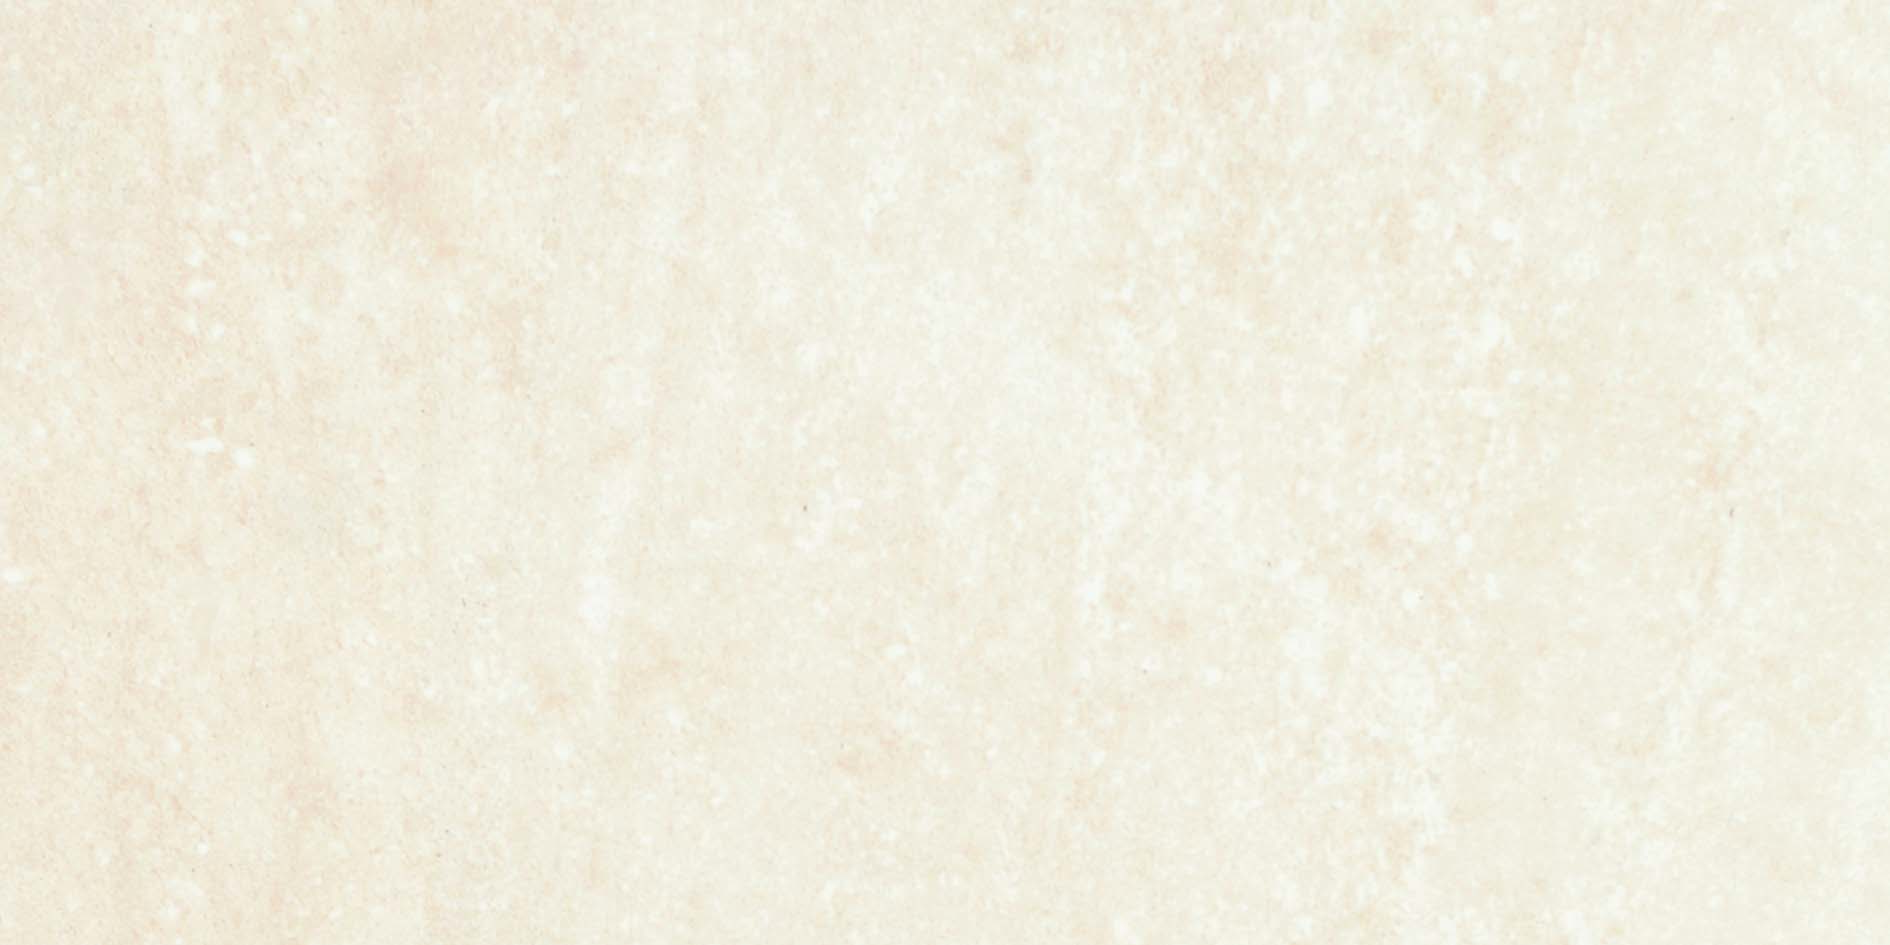 60x120 Pietra Pienza Tile Beige Semi Glossy